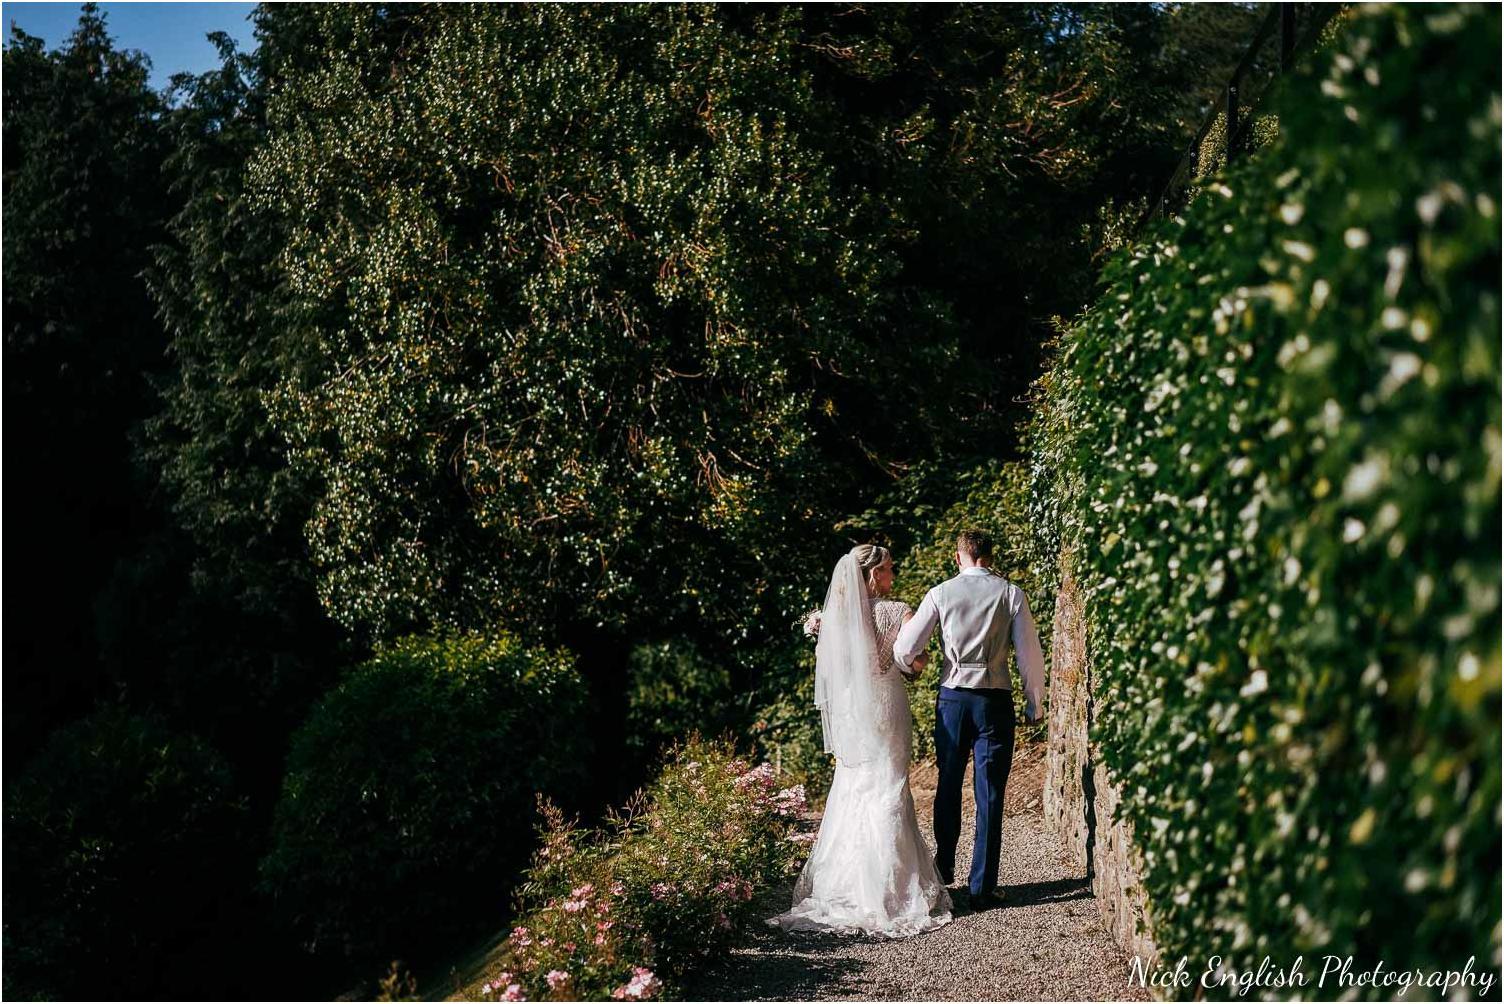 Mitton_Hall_Wedding_Photograph-137.jpg